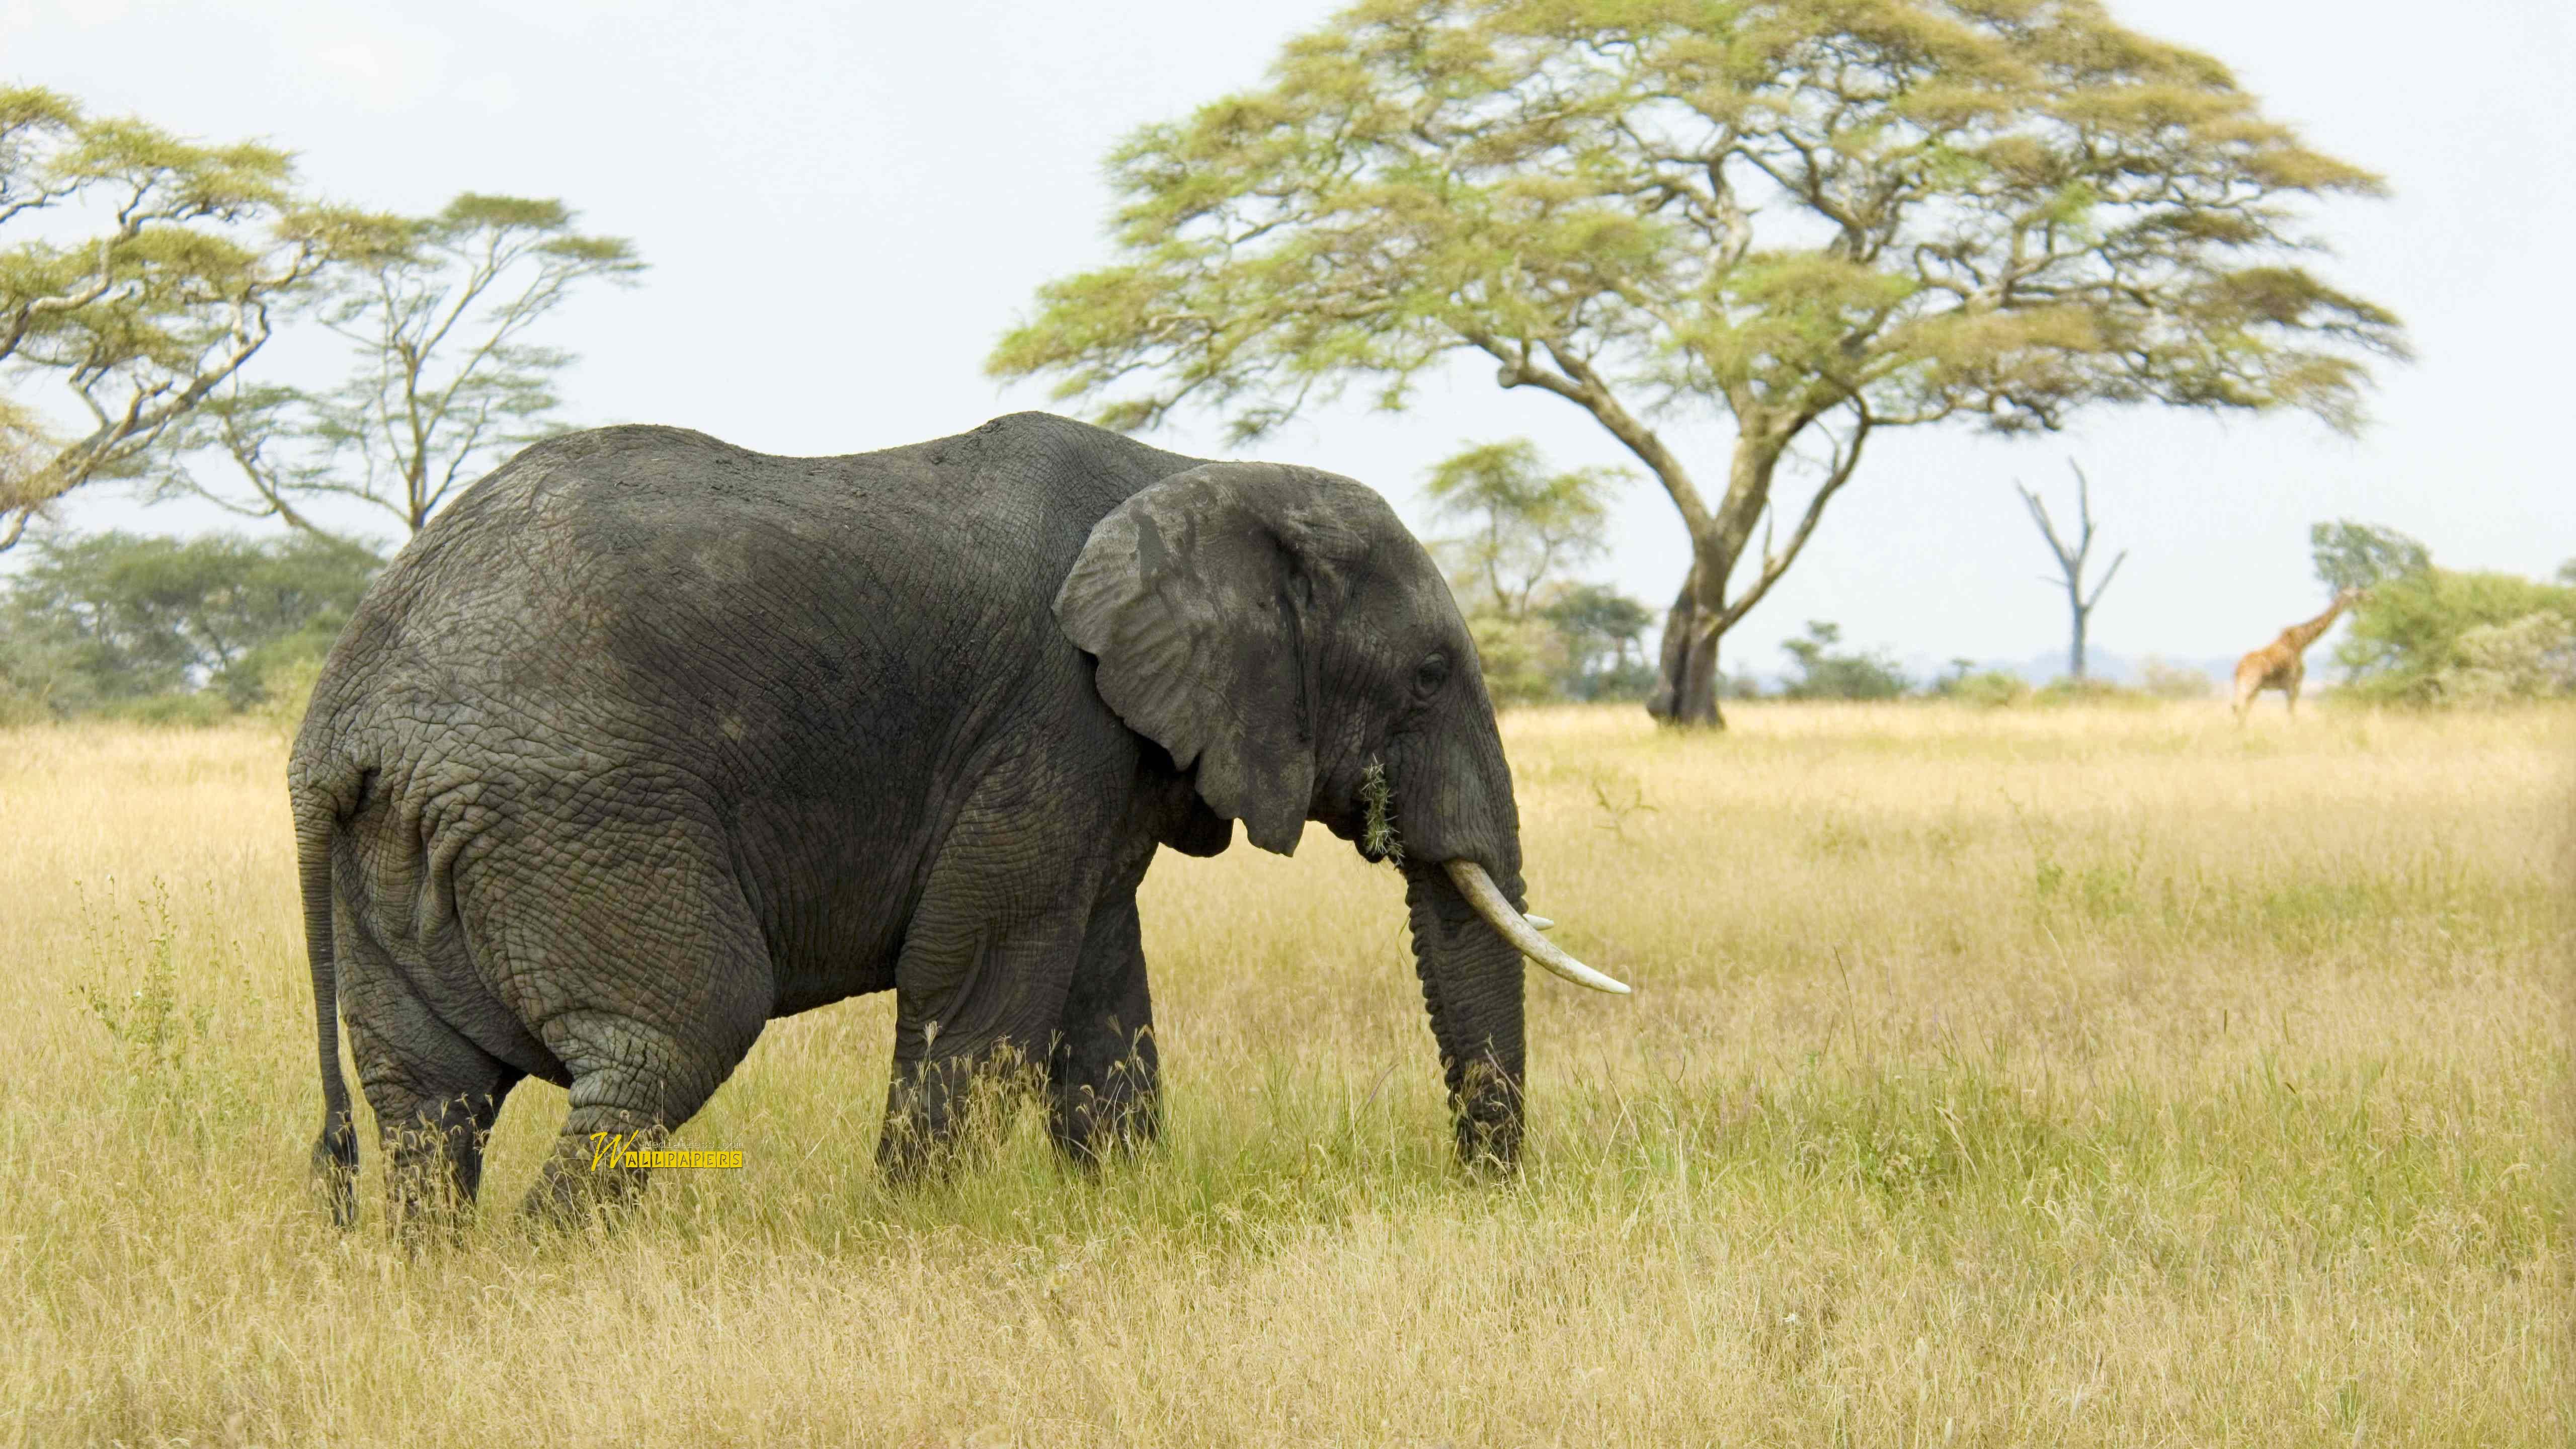 beautiful-elephant-and-giraffe-in-the-wild-full-hd-wallpaper